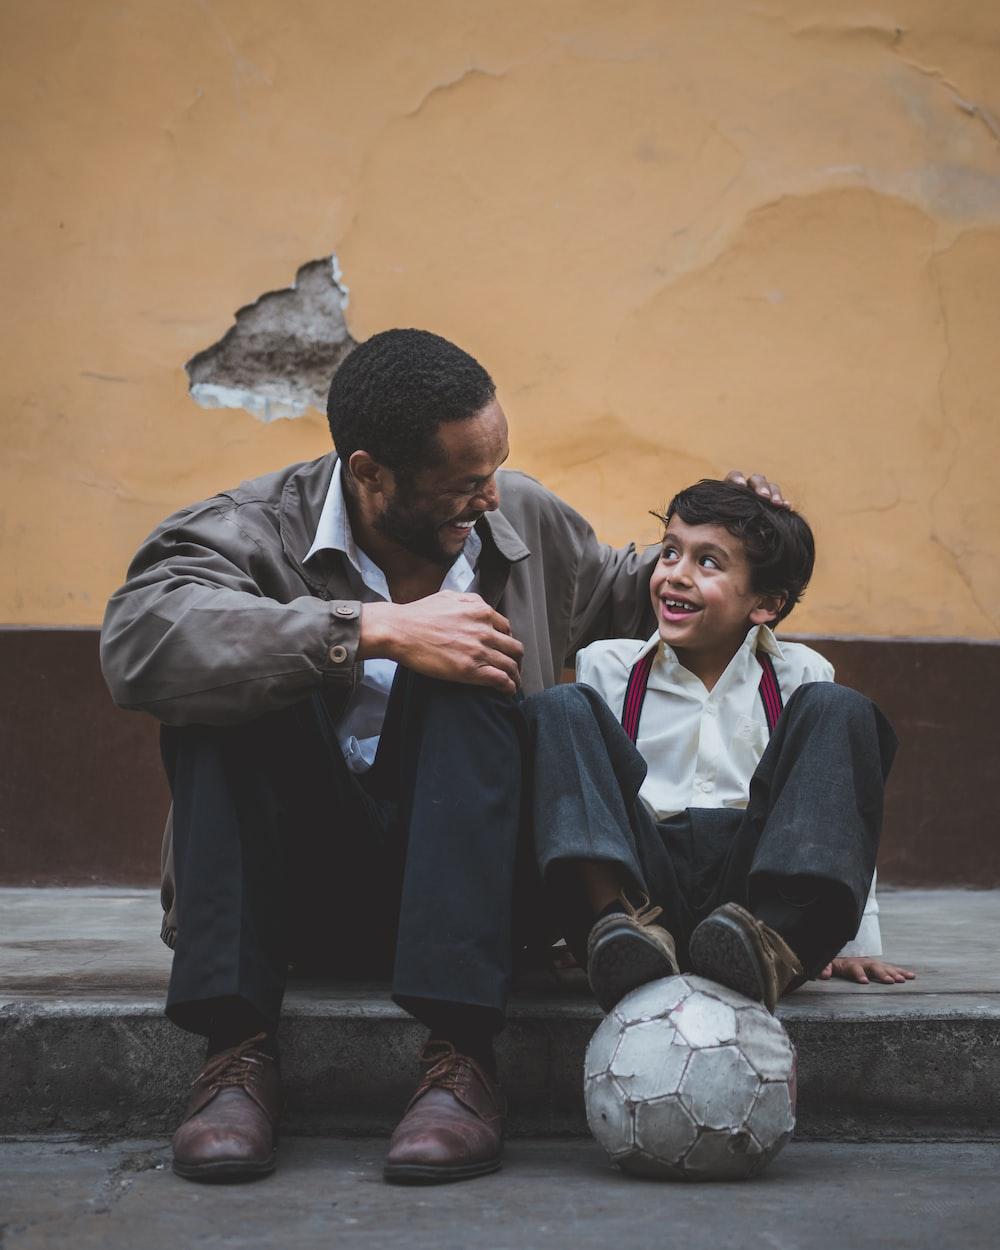 man holding boy's head